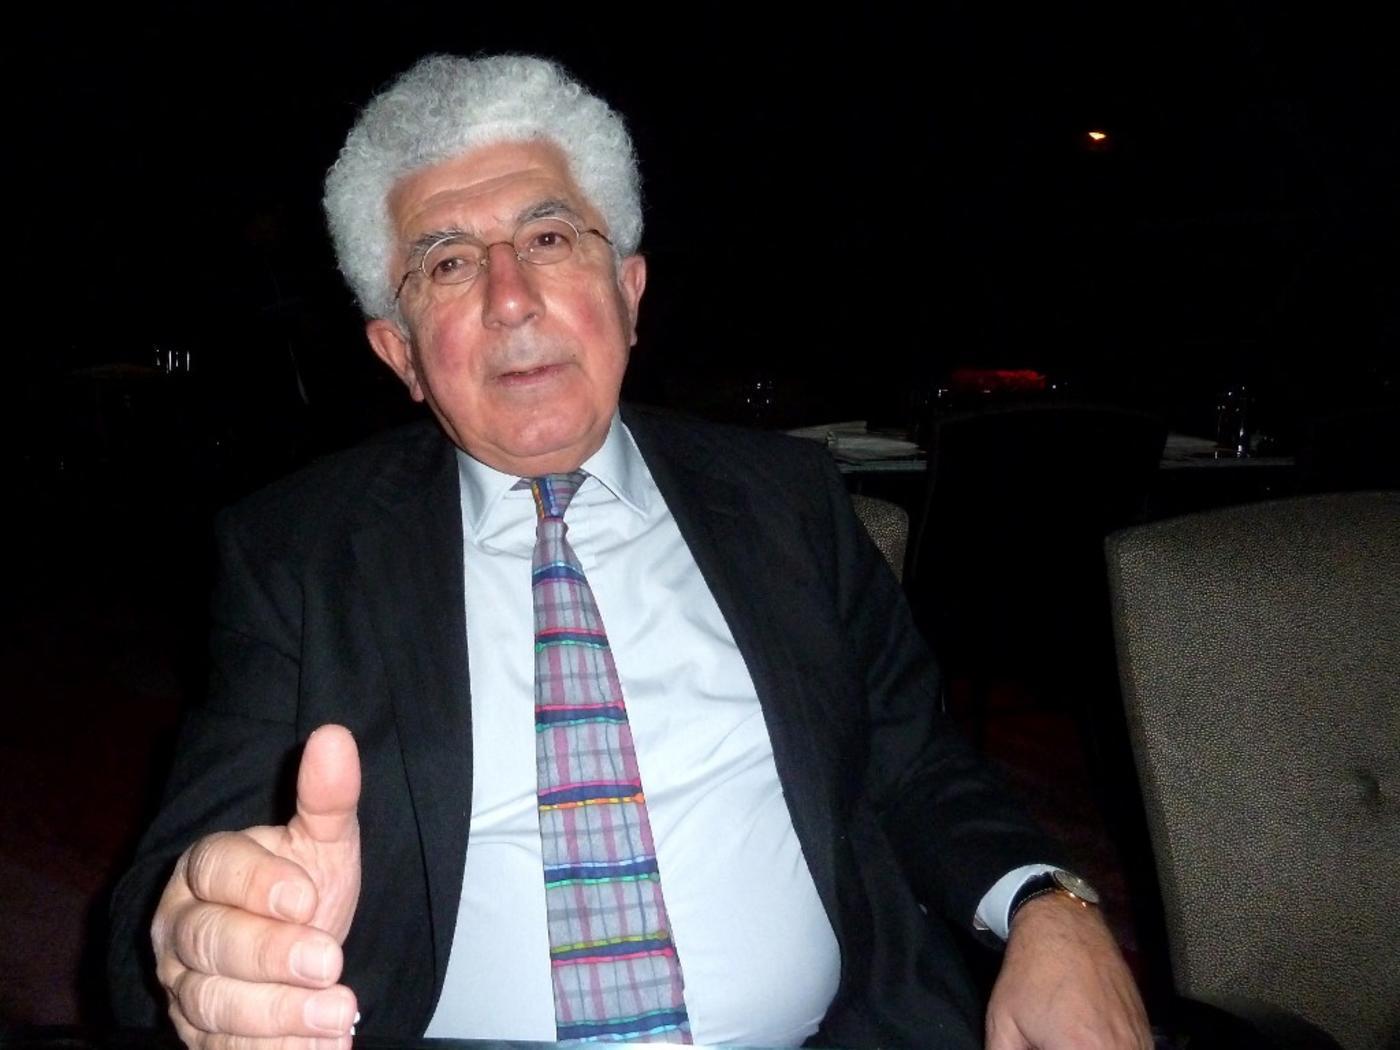 Avi Shlaim slams UK government over 'shameful legacy' of support for Israel